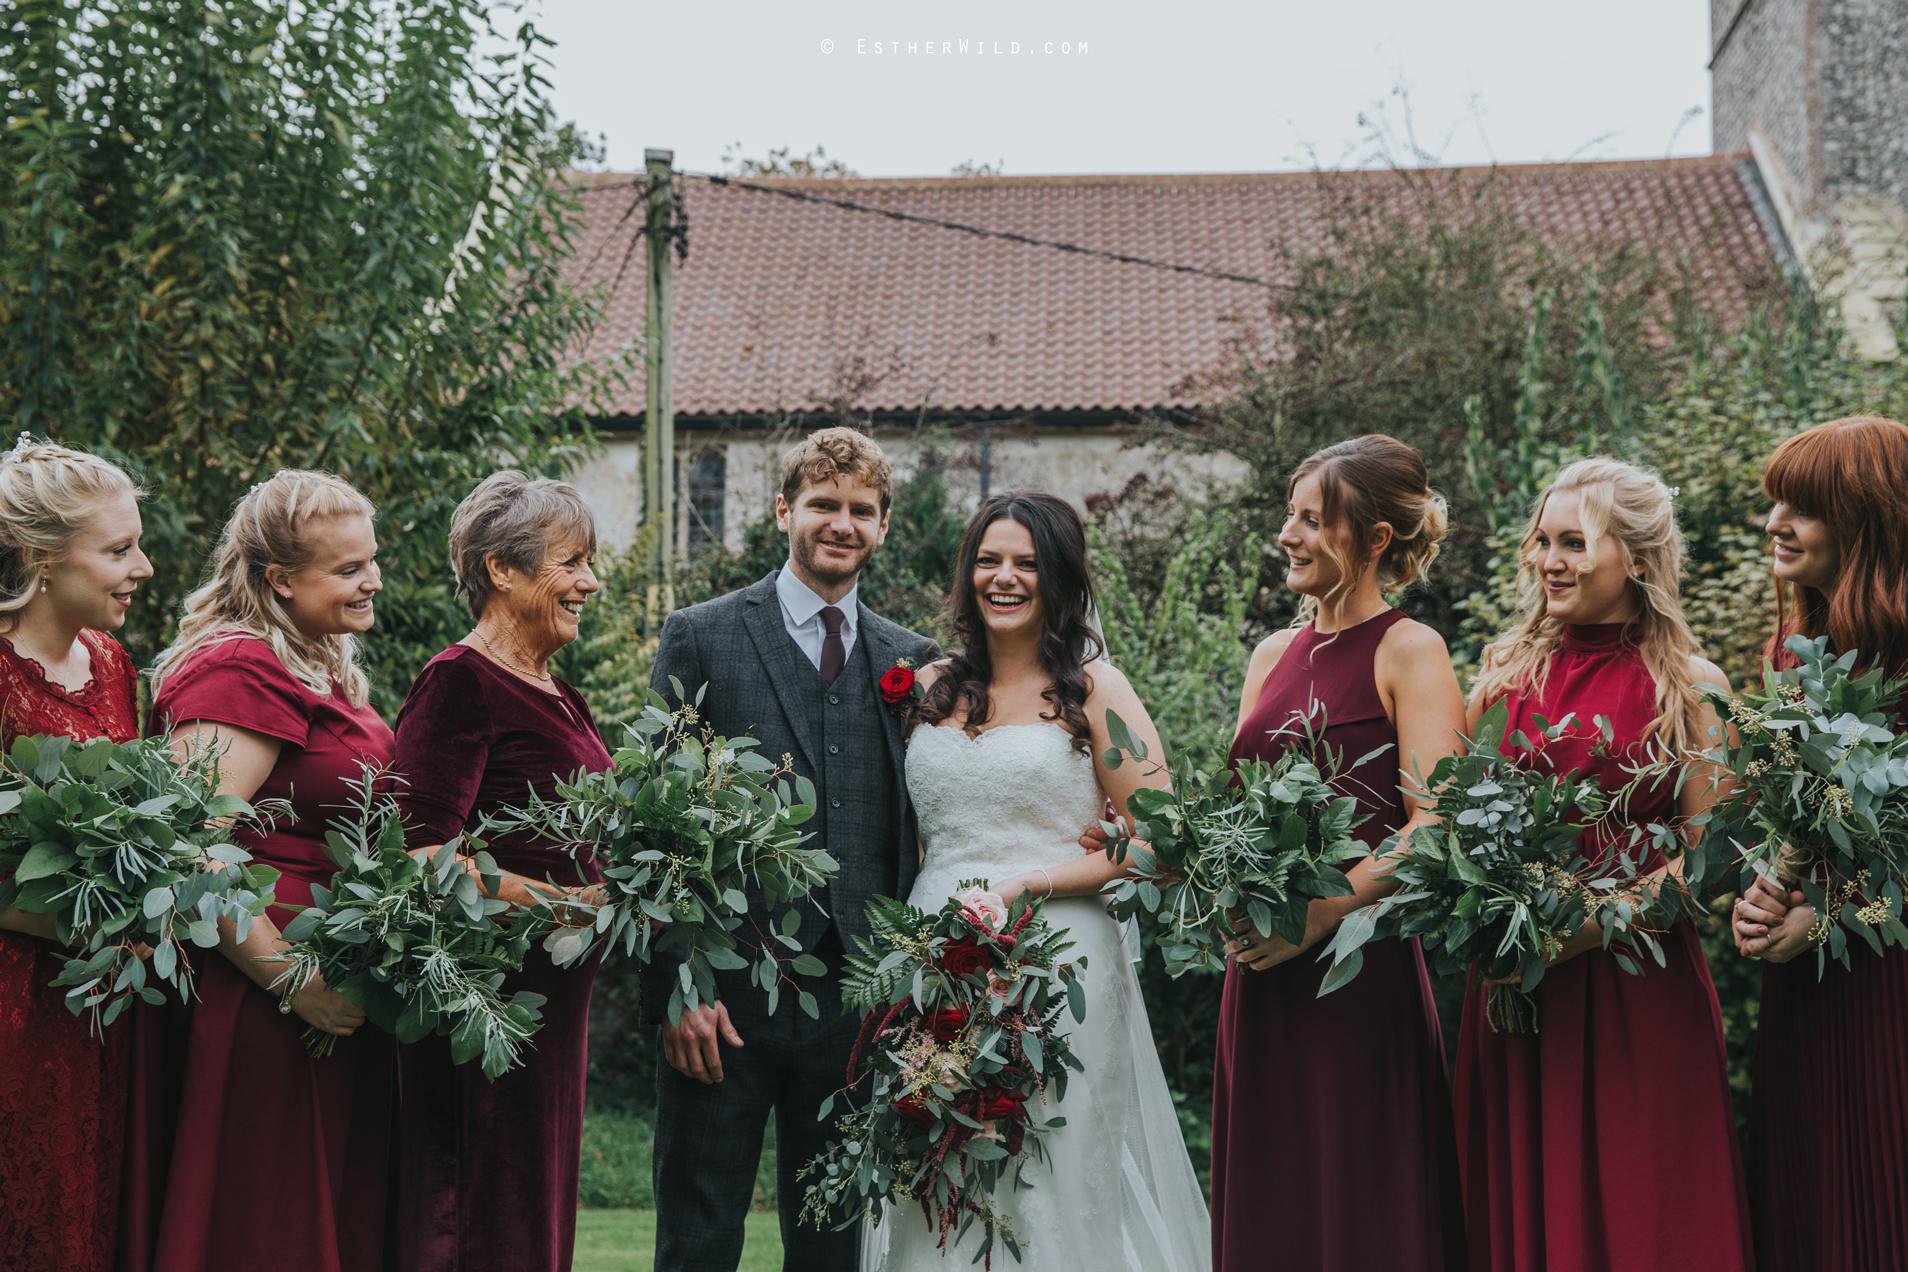 Reading_Room_Weddings_Alby_Norwich_Photographer_Esther_Wild_IMG_1379.jpg